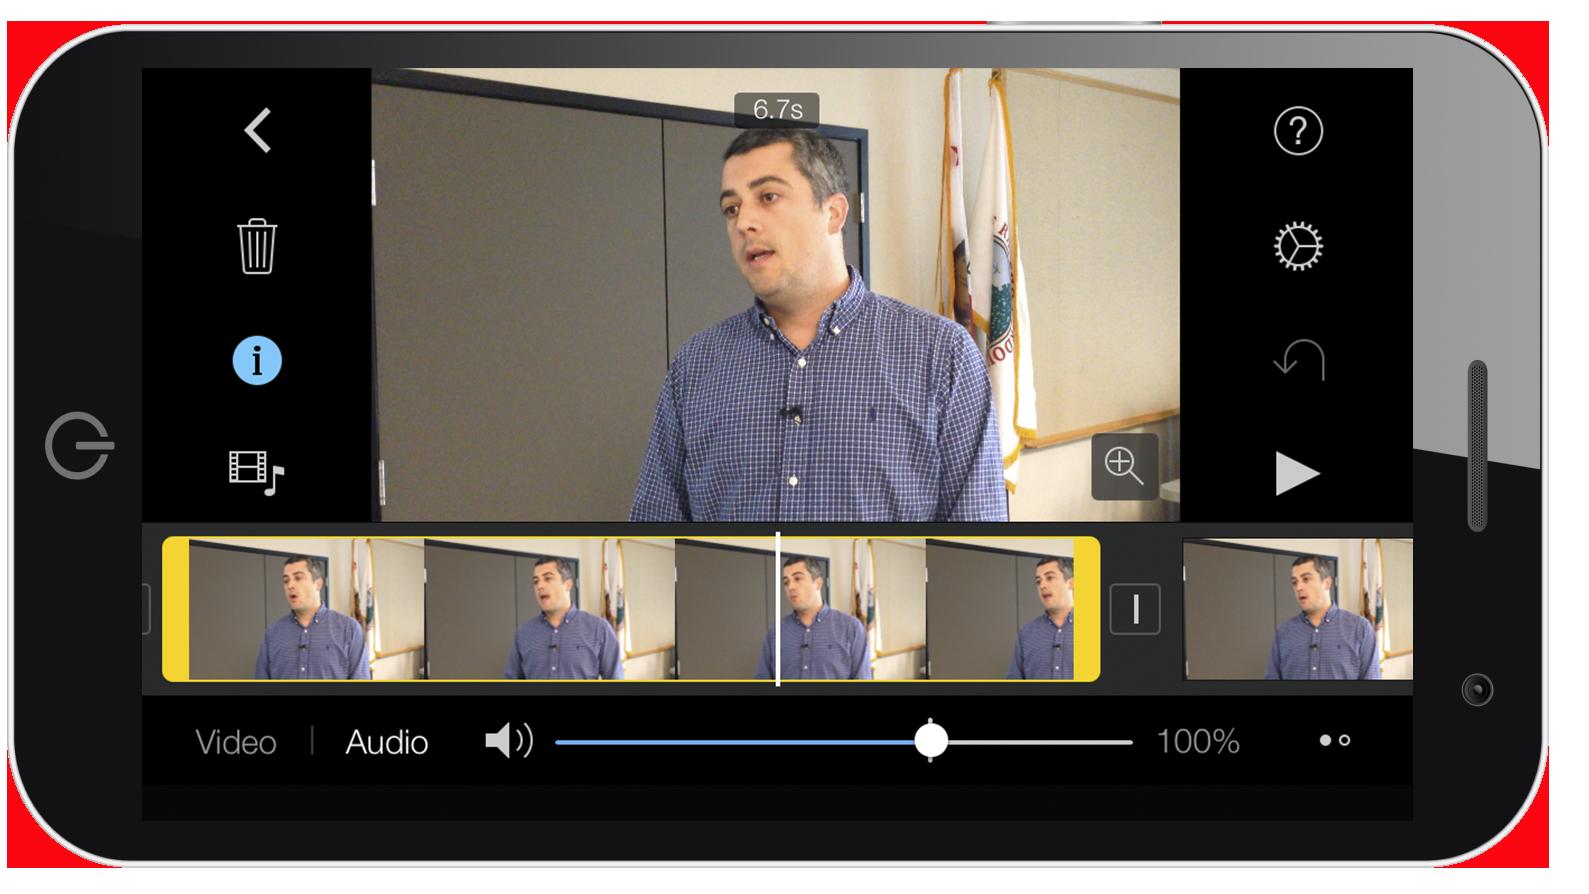 iMovie editing interface on iPhone